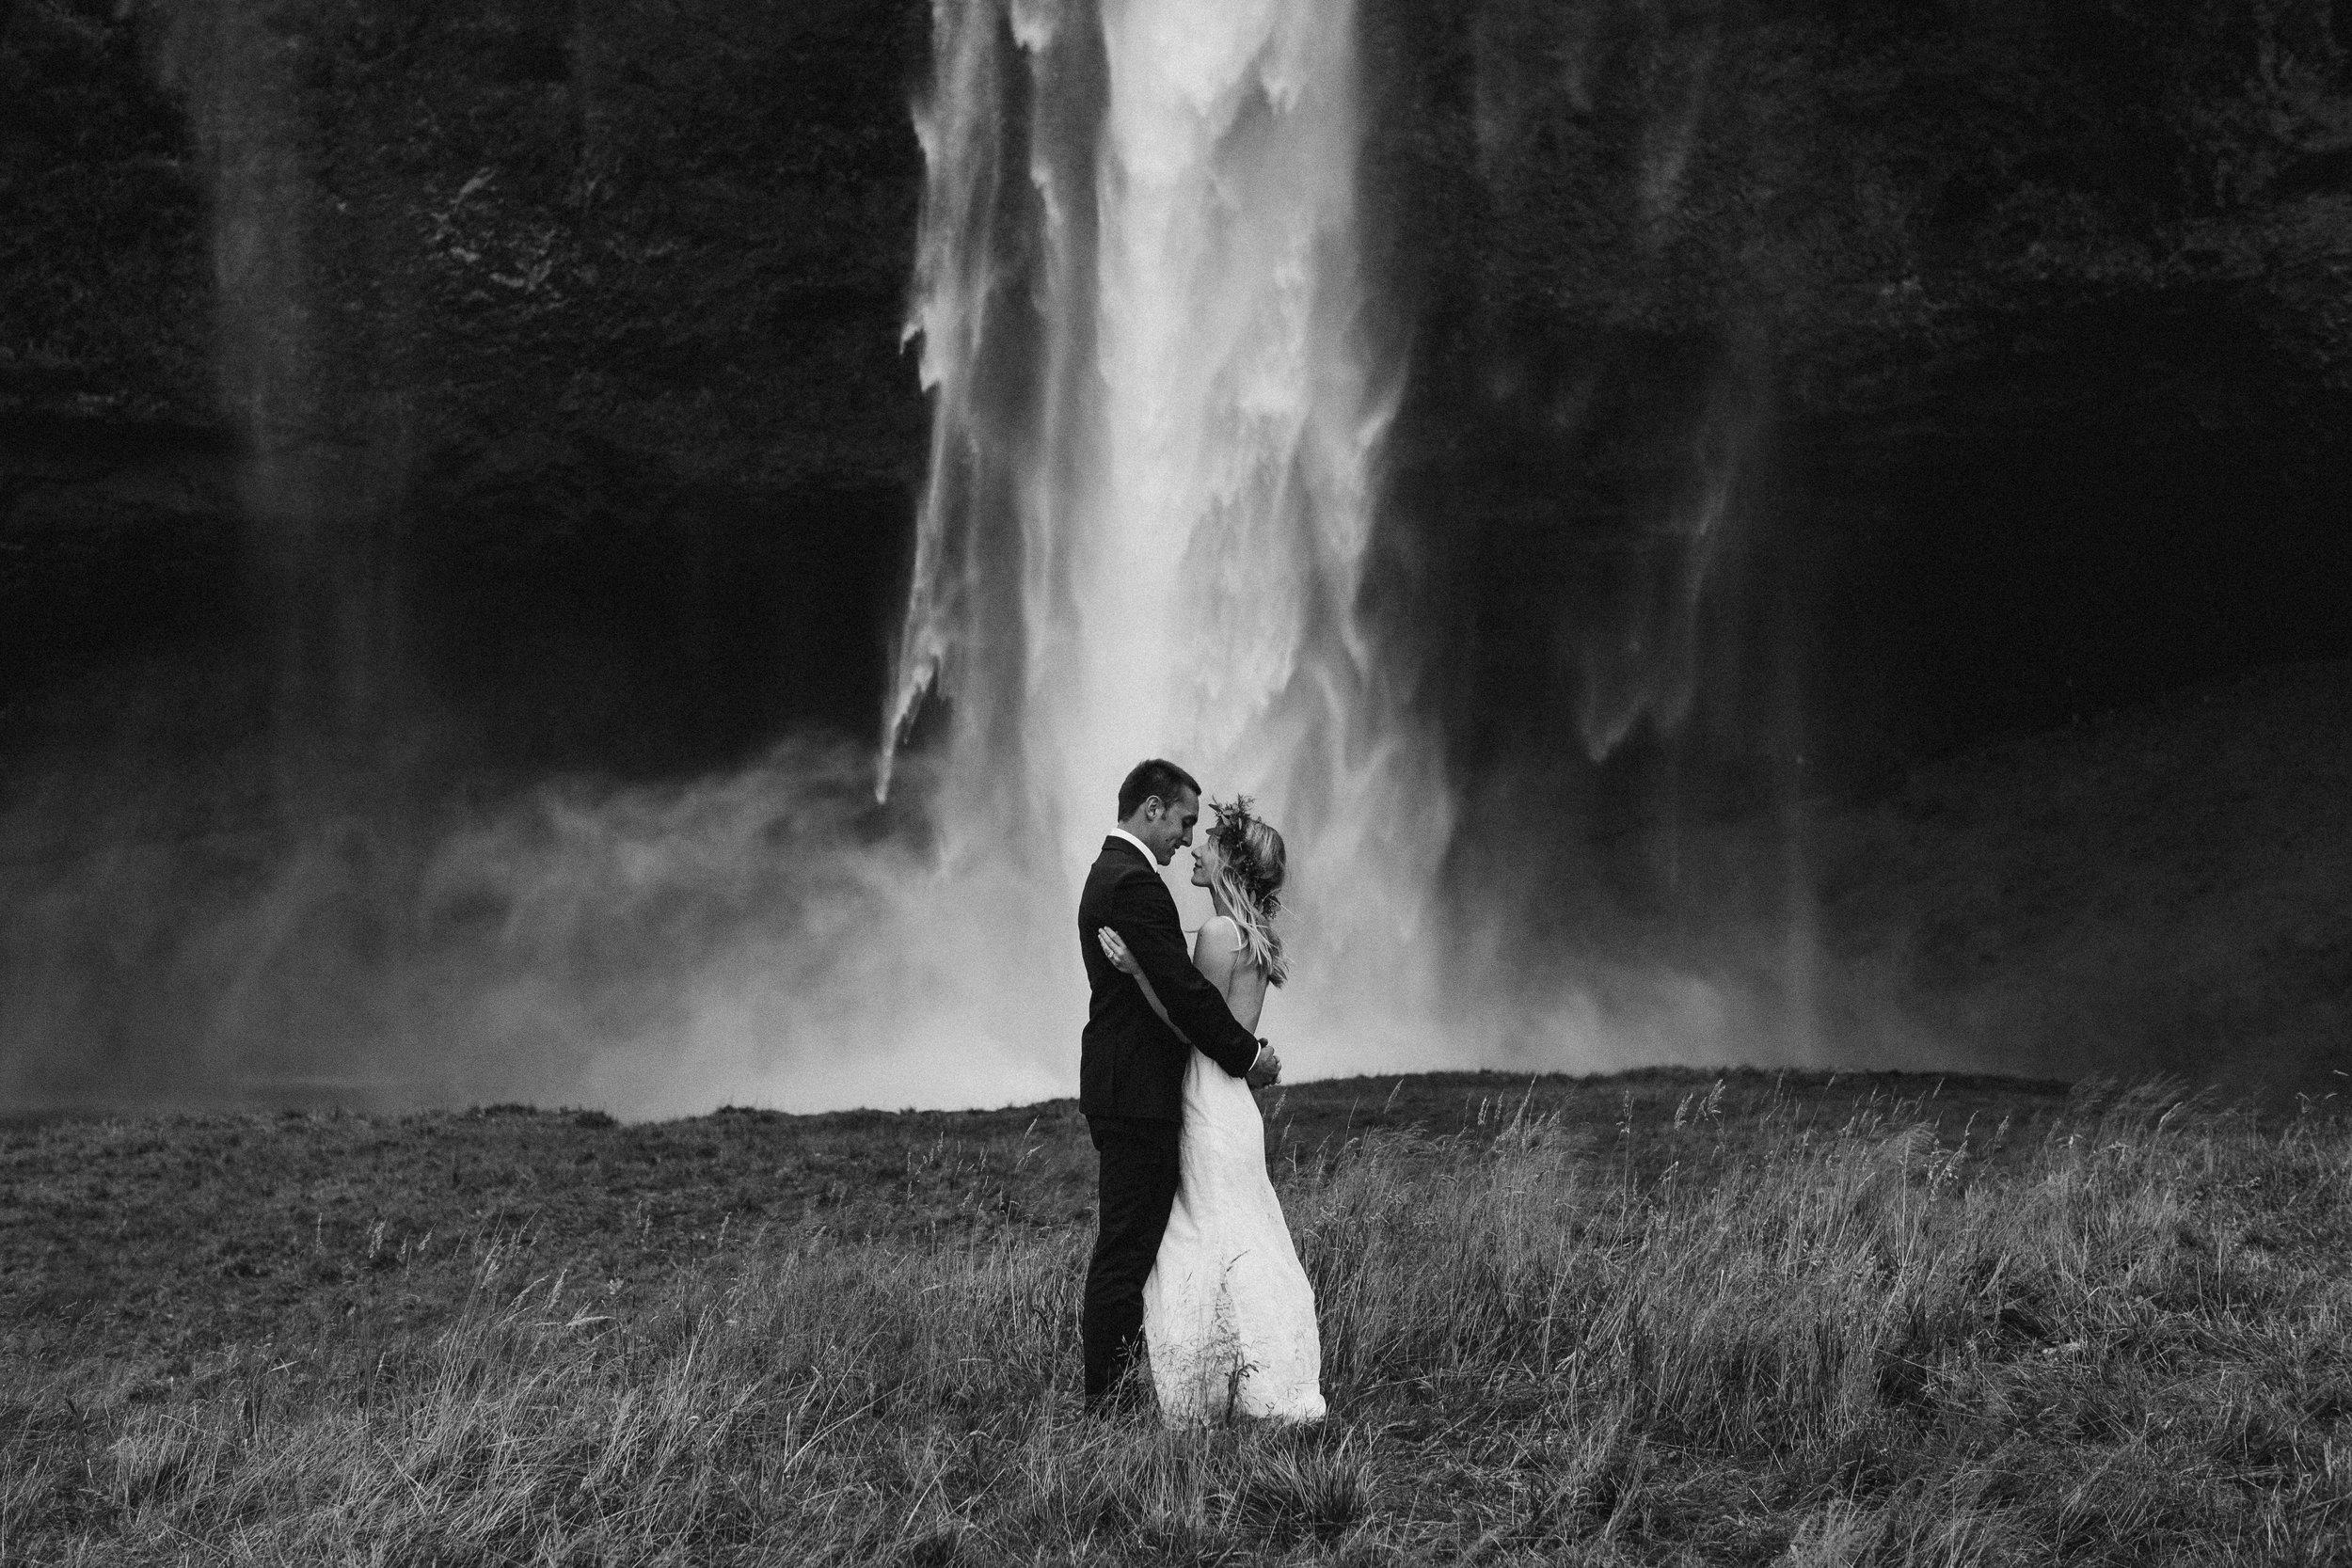 Shane-Hannah-Iceland-Elopement-Vik-Dyrhólaey-Black-Sand-Beaches-Selandjafoss-Evan-And-Alycia-Photography-Traveling-Wedding-Photographers